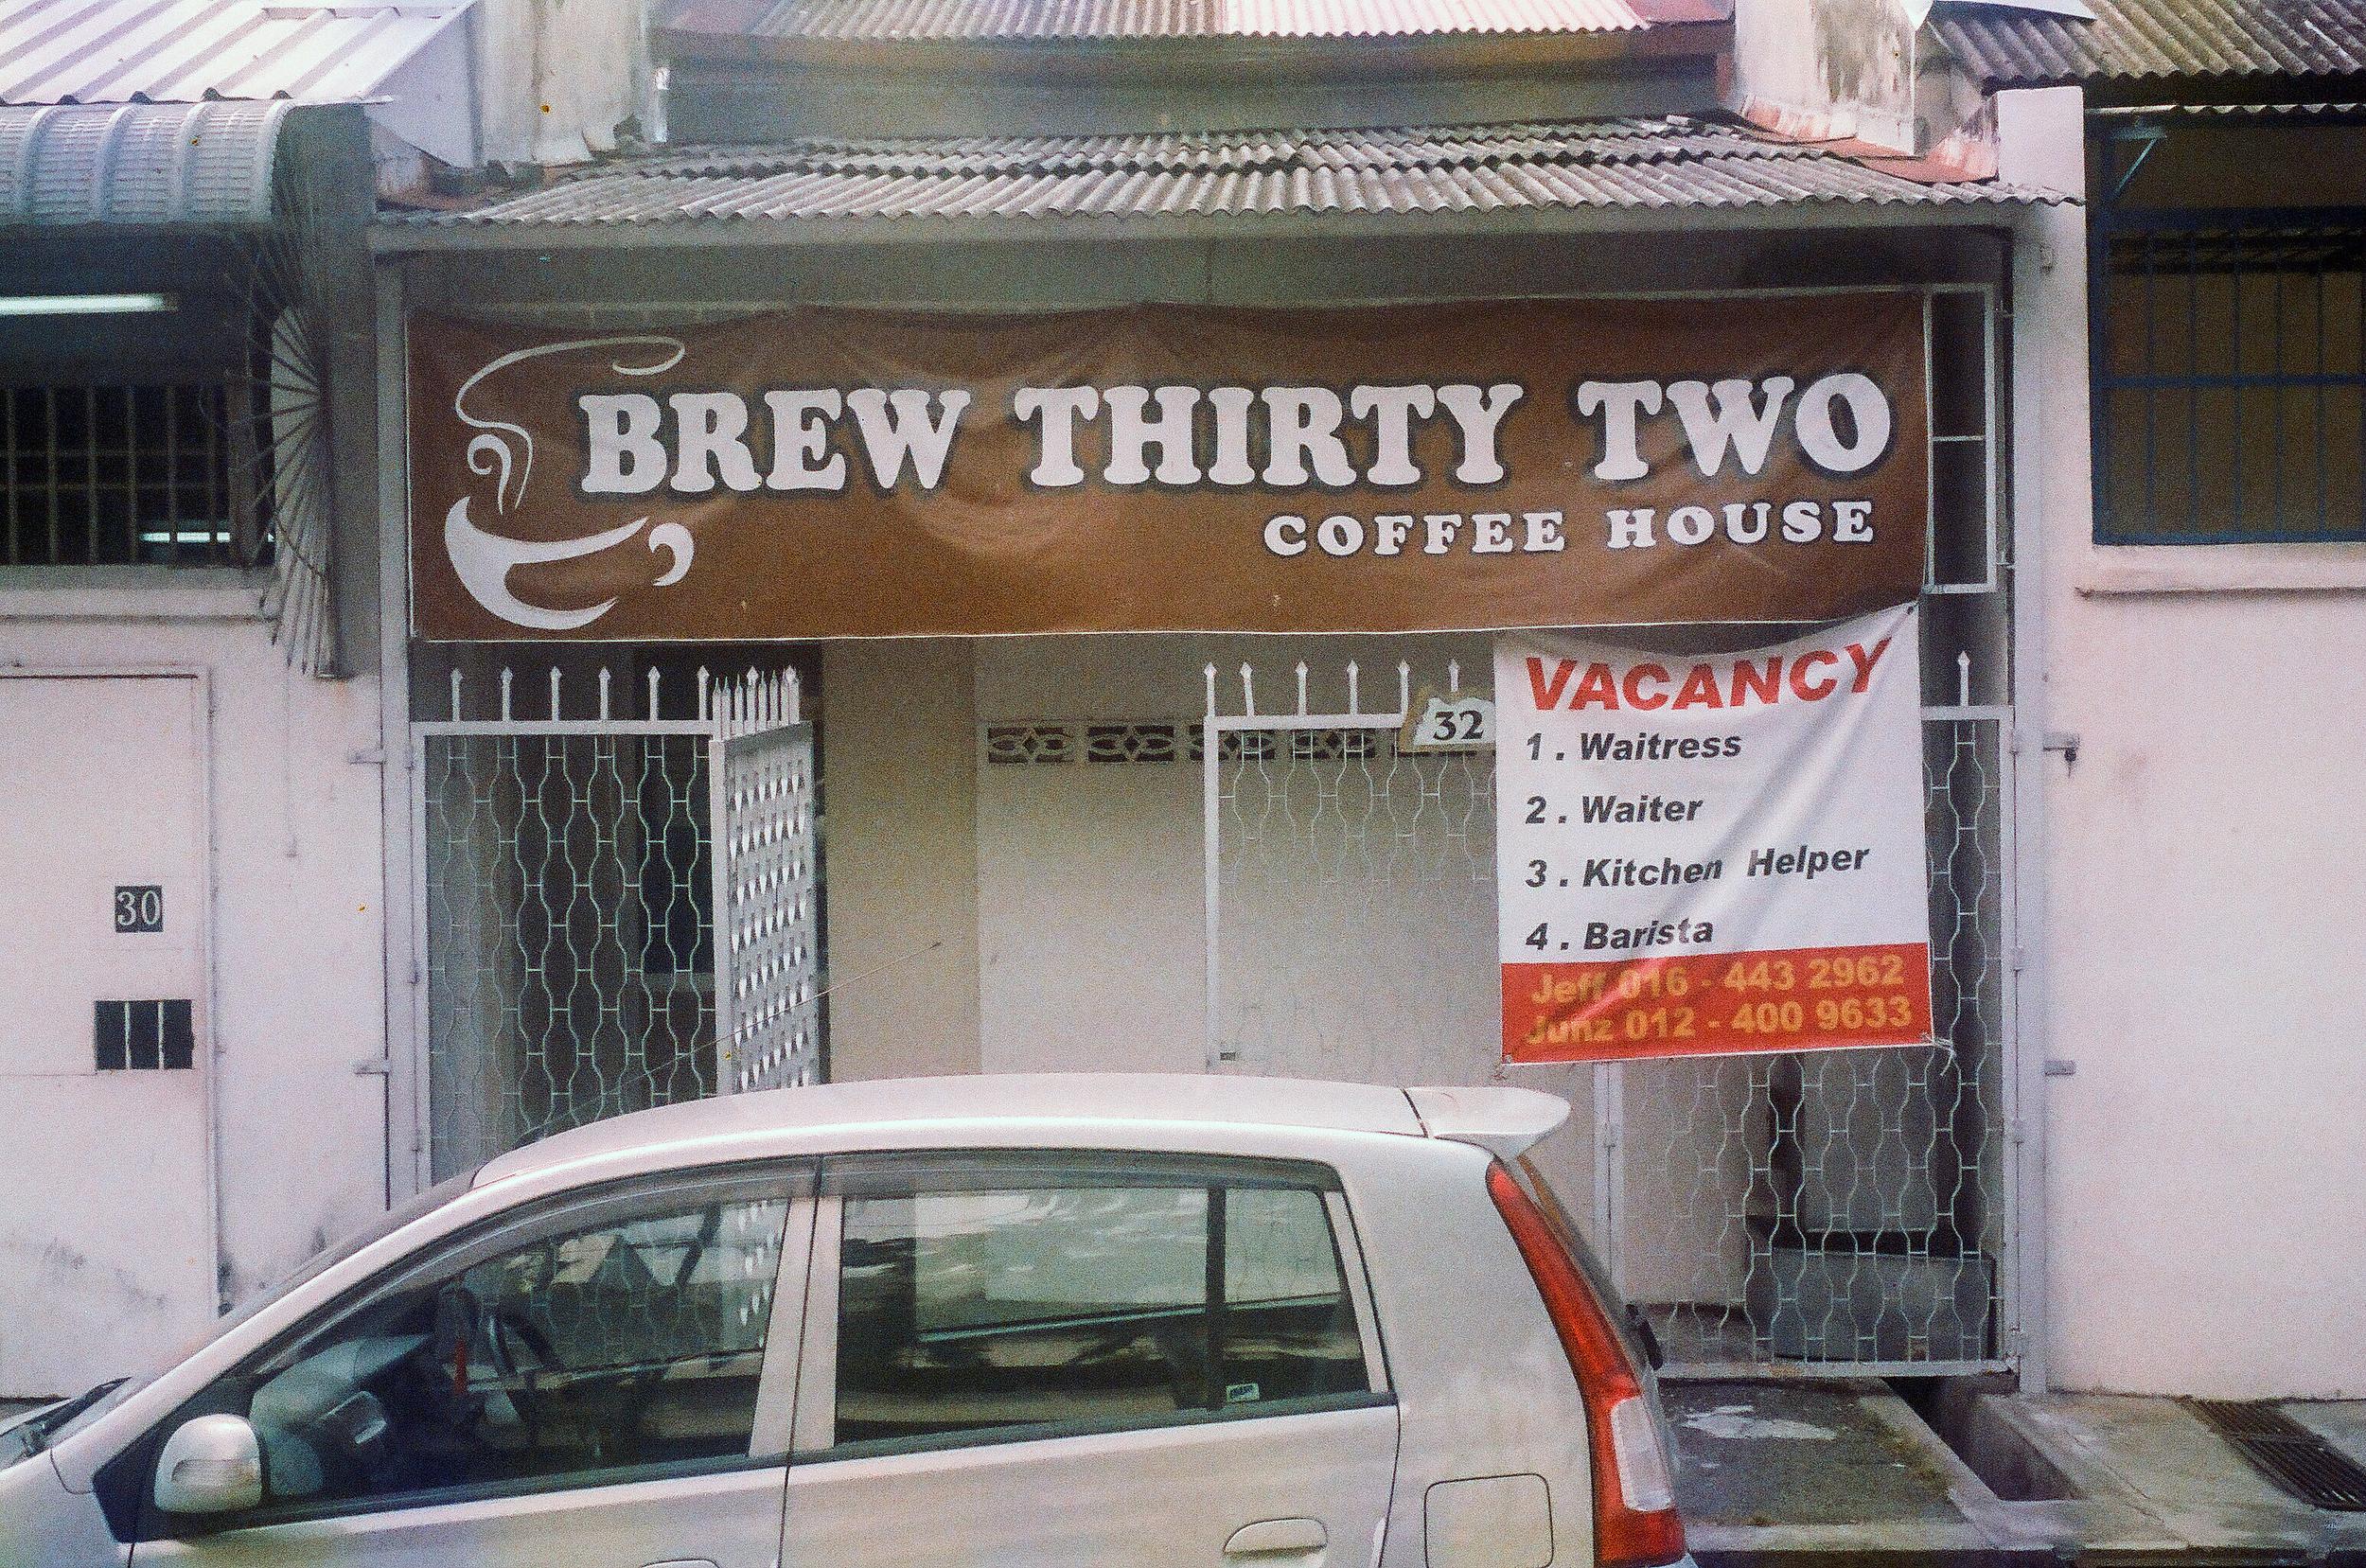 Now hiring: Everyone?